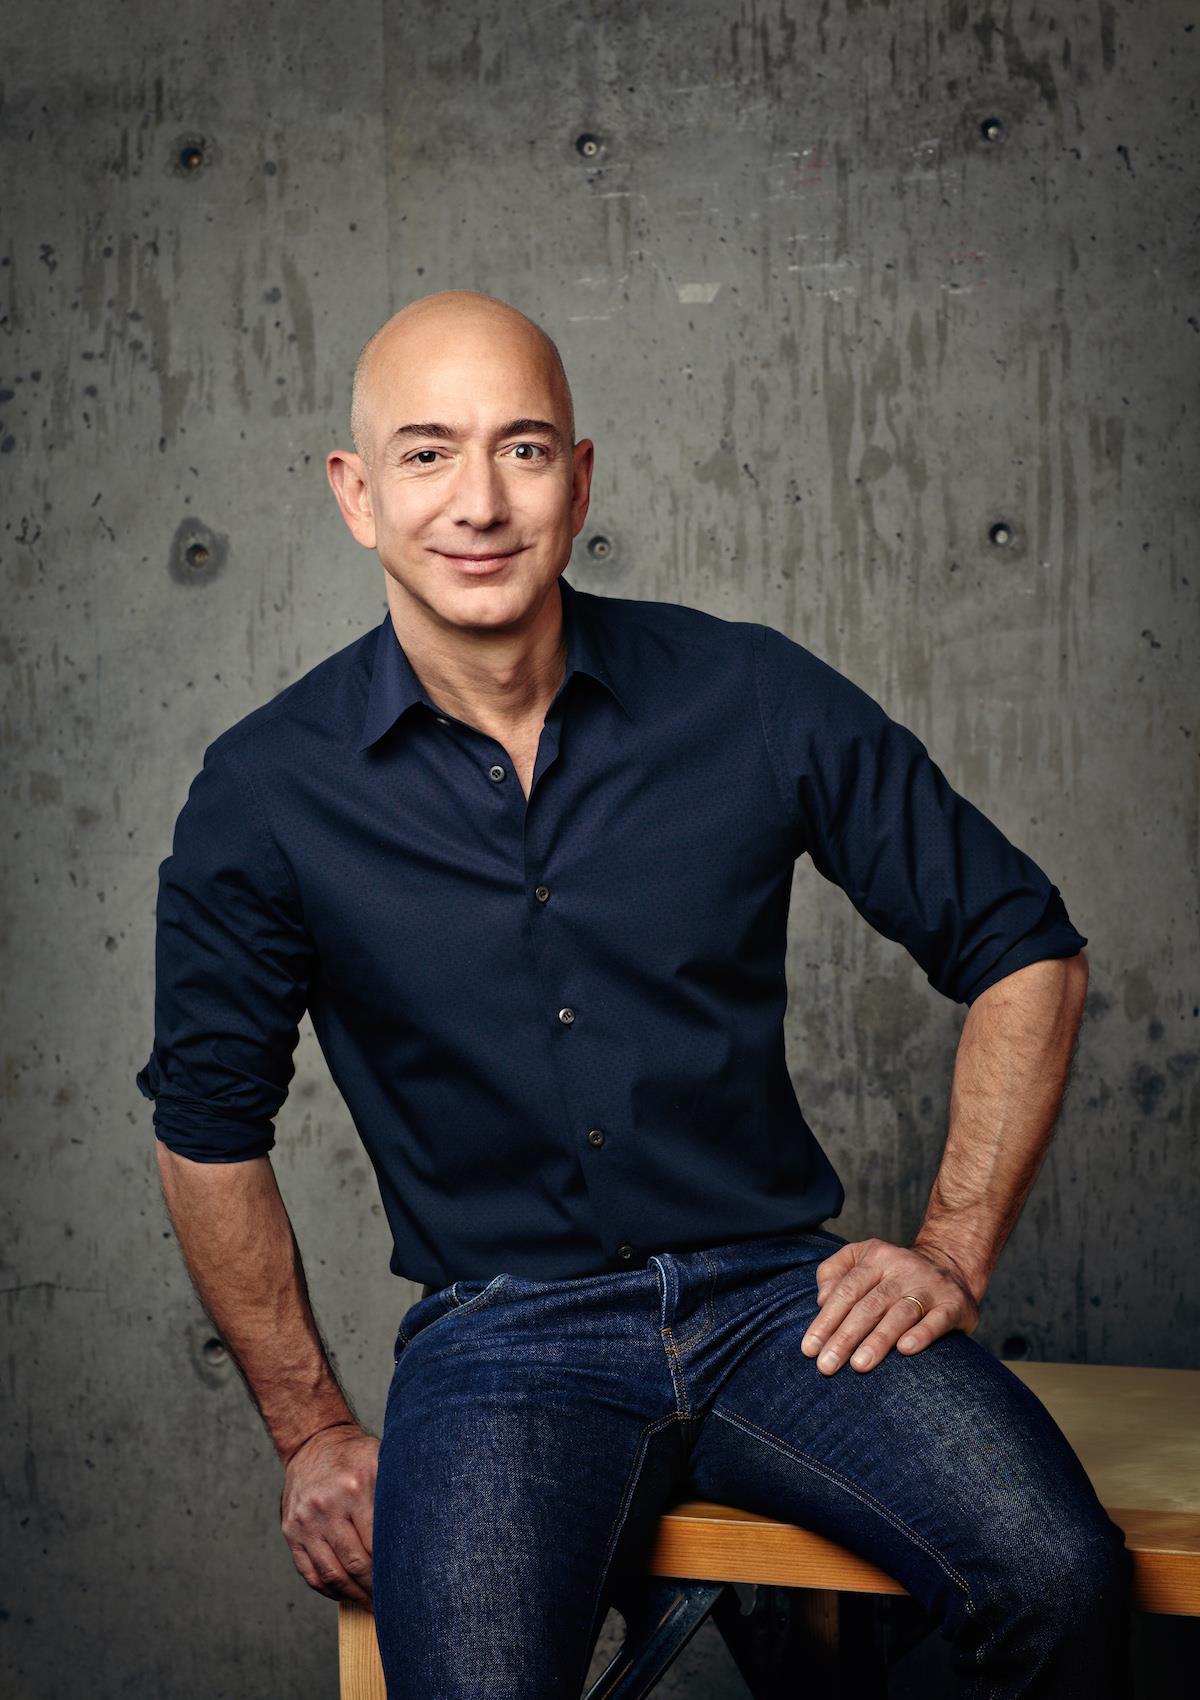 Jeff Bezos ()